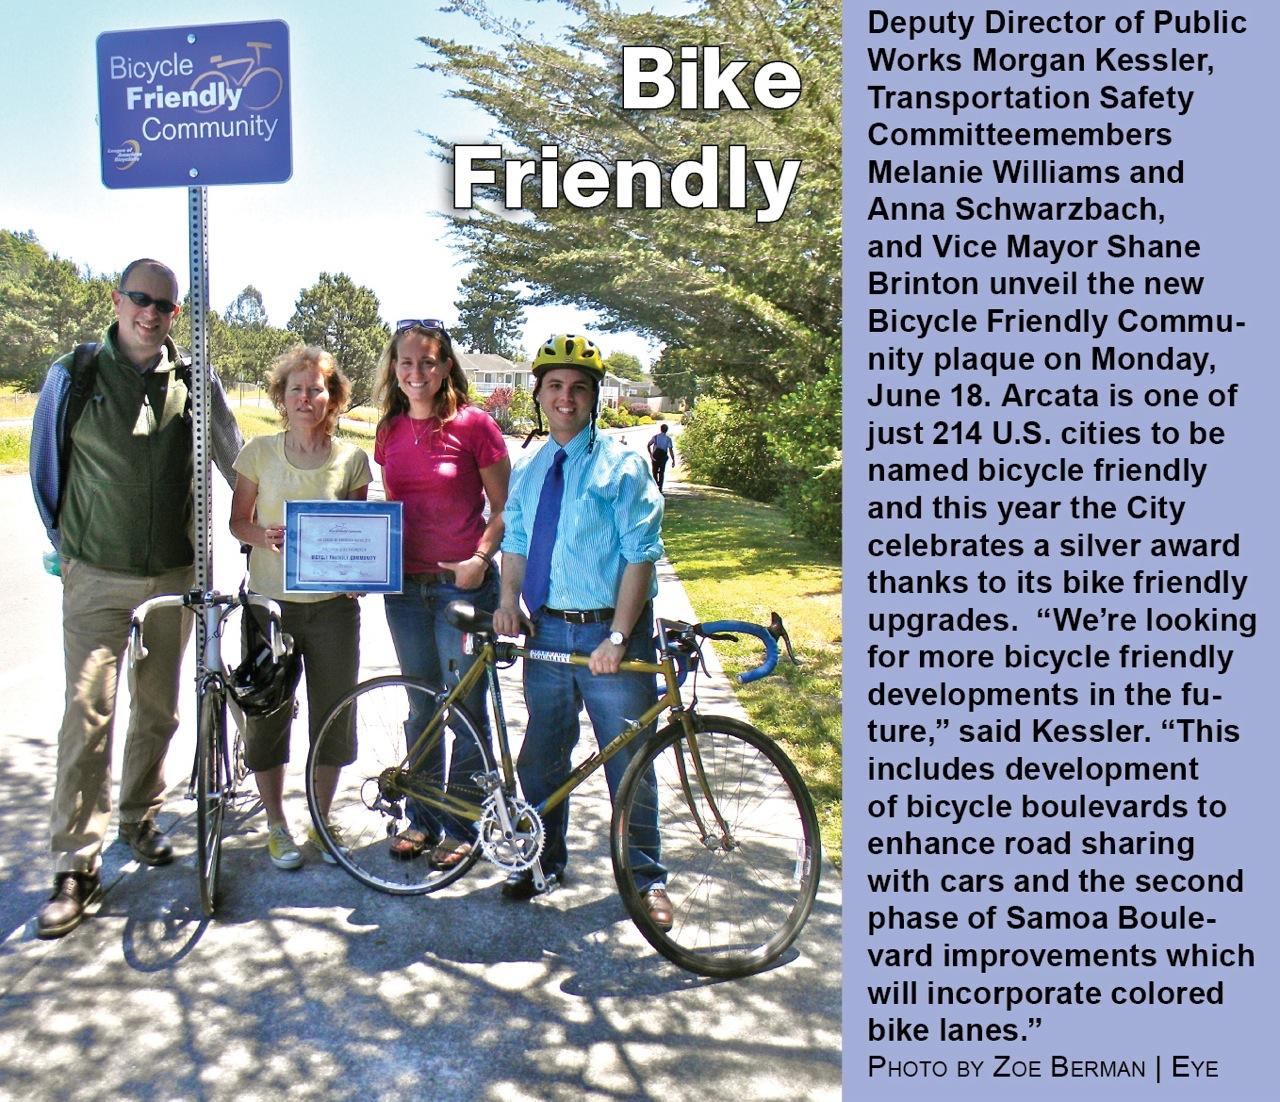 bike-friendly